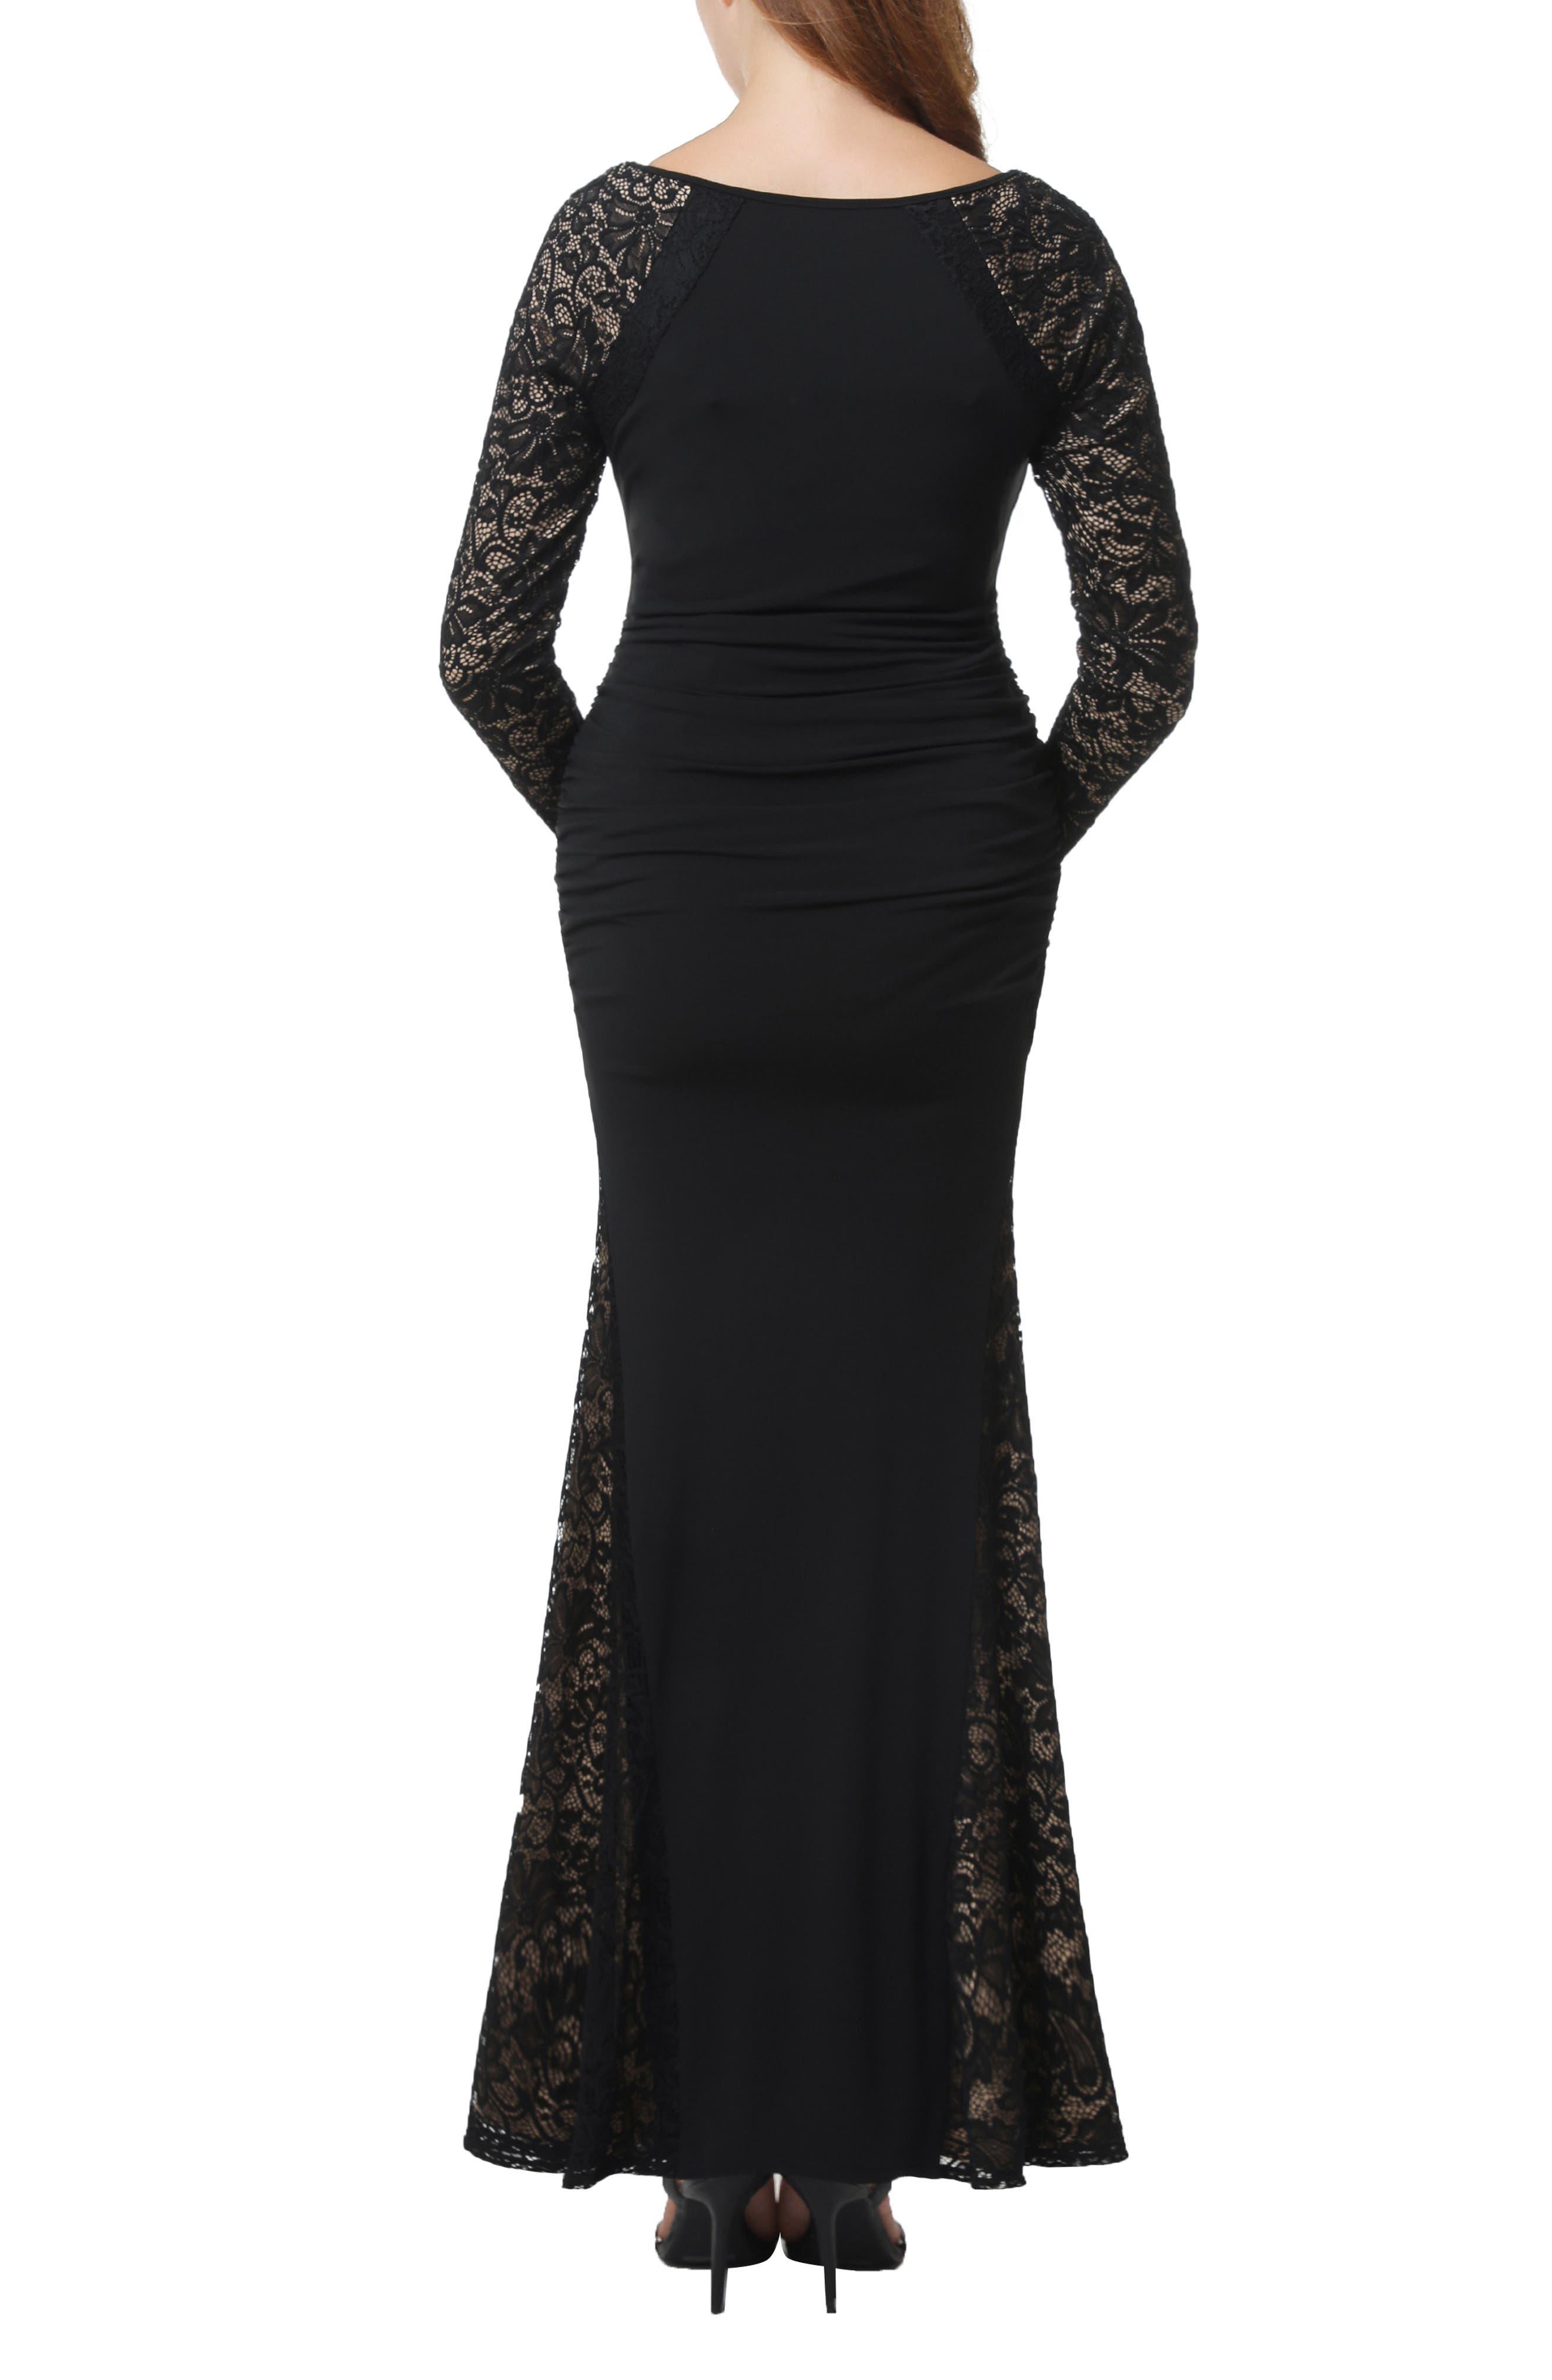 Bella Maternity Maxi Dress,                             Alternate thumbnail 2, color,                             BLACK